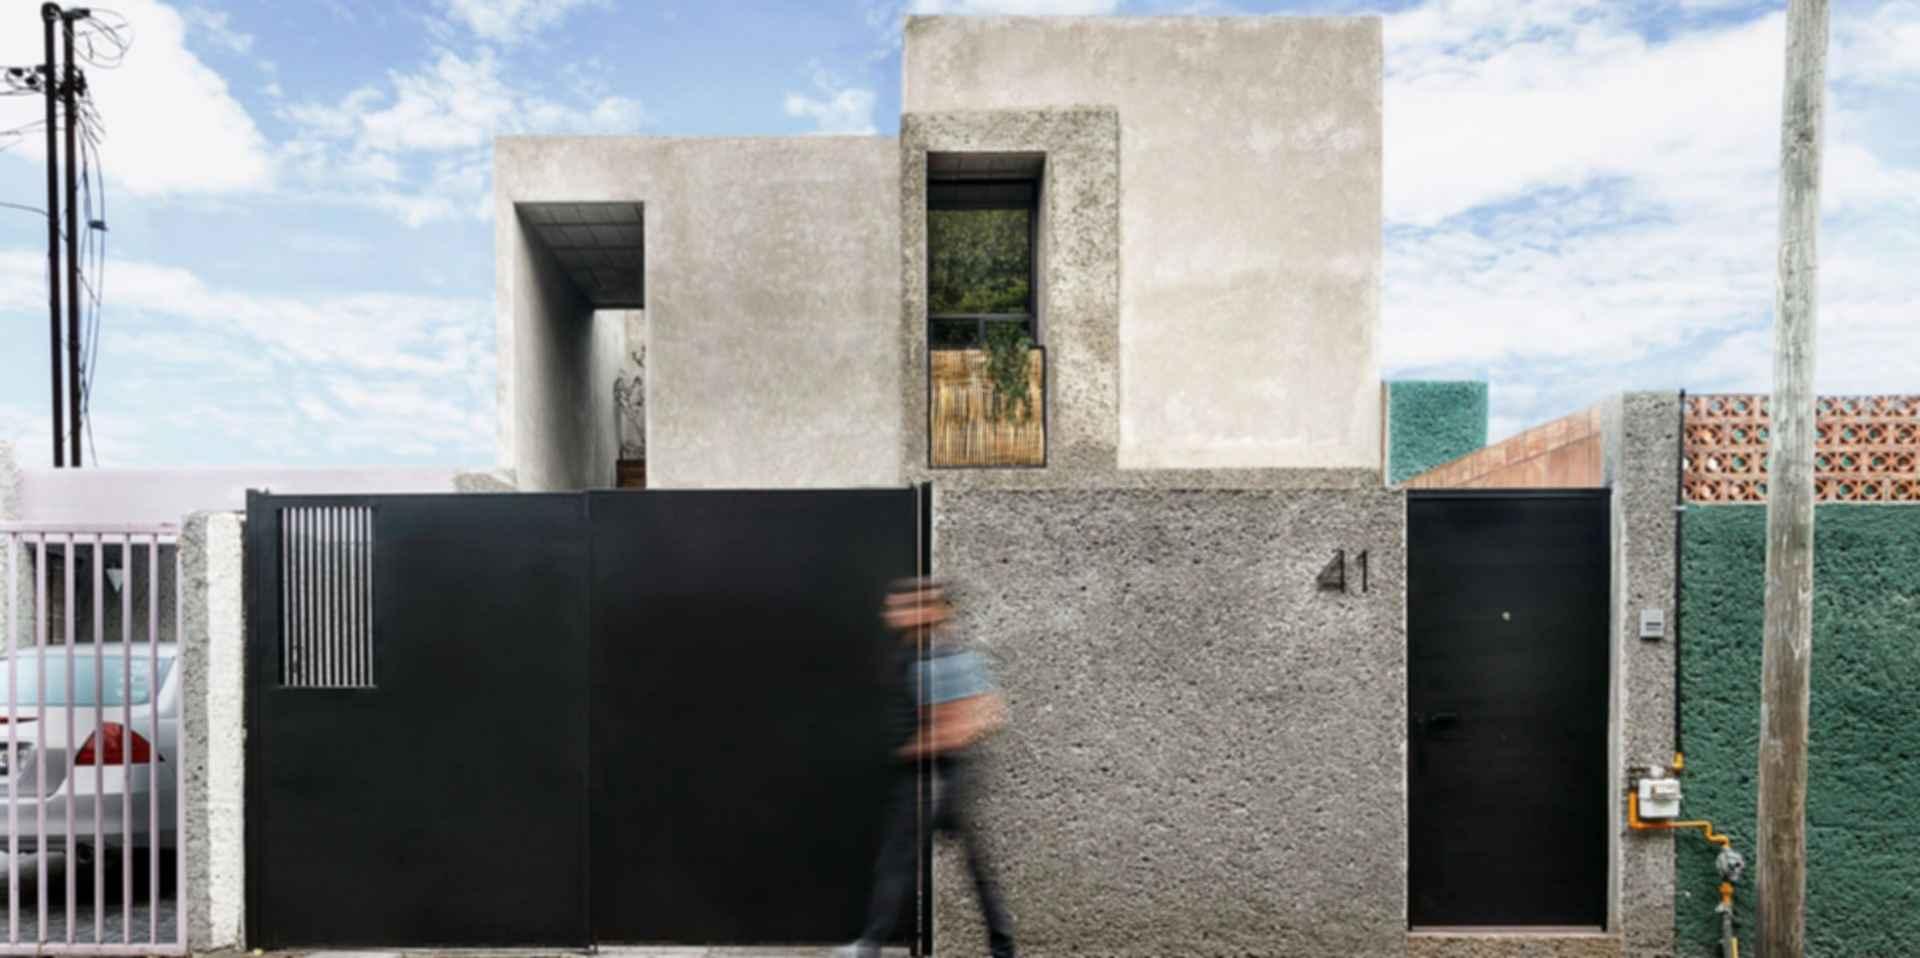 Studio House - Exterior/Street View